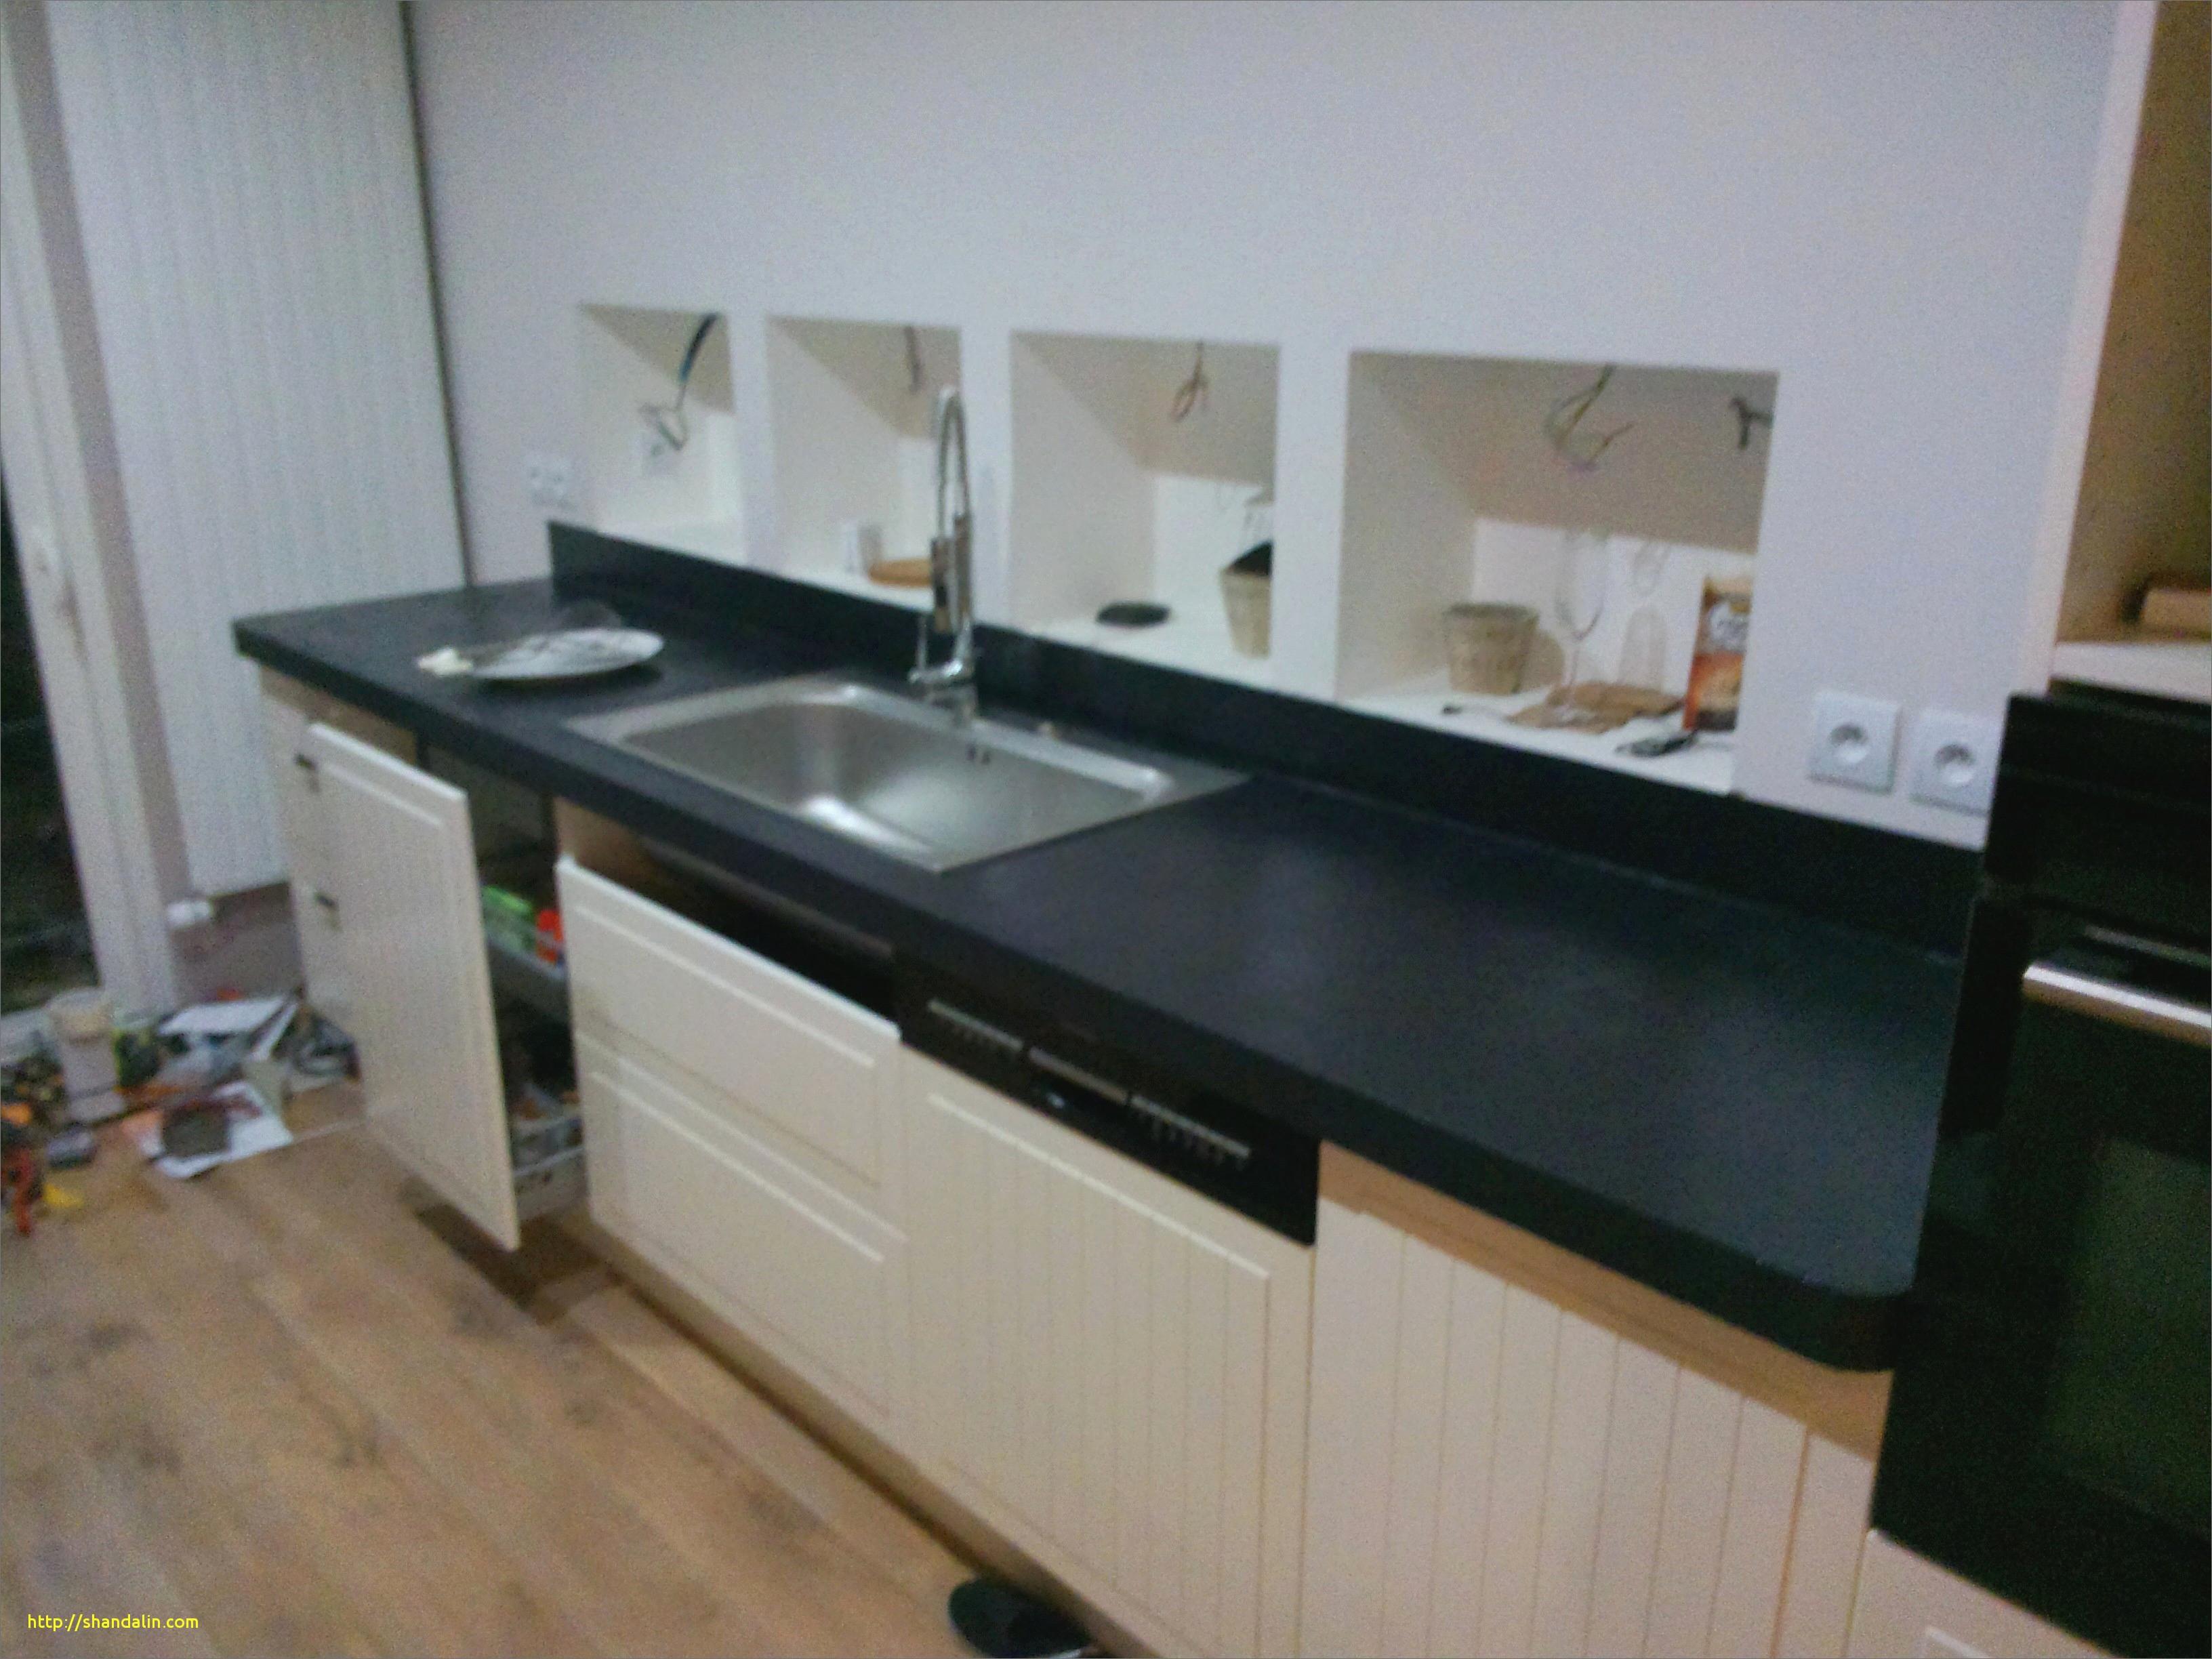 recouvrir un plan de travail en beton cir lille menage. Black Bedroom Furniture Sets. Home Design Ideas